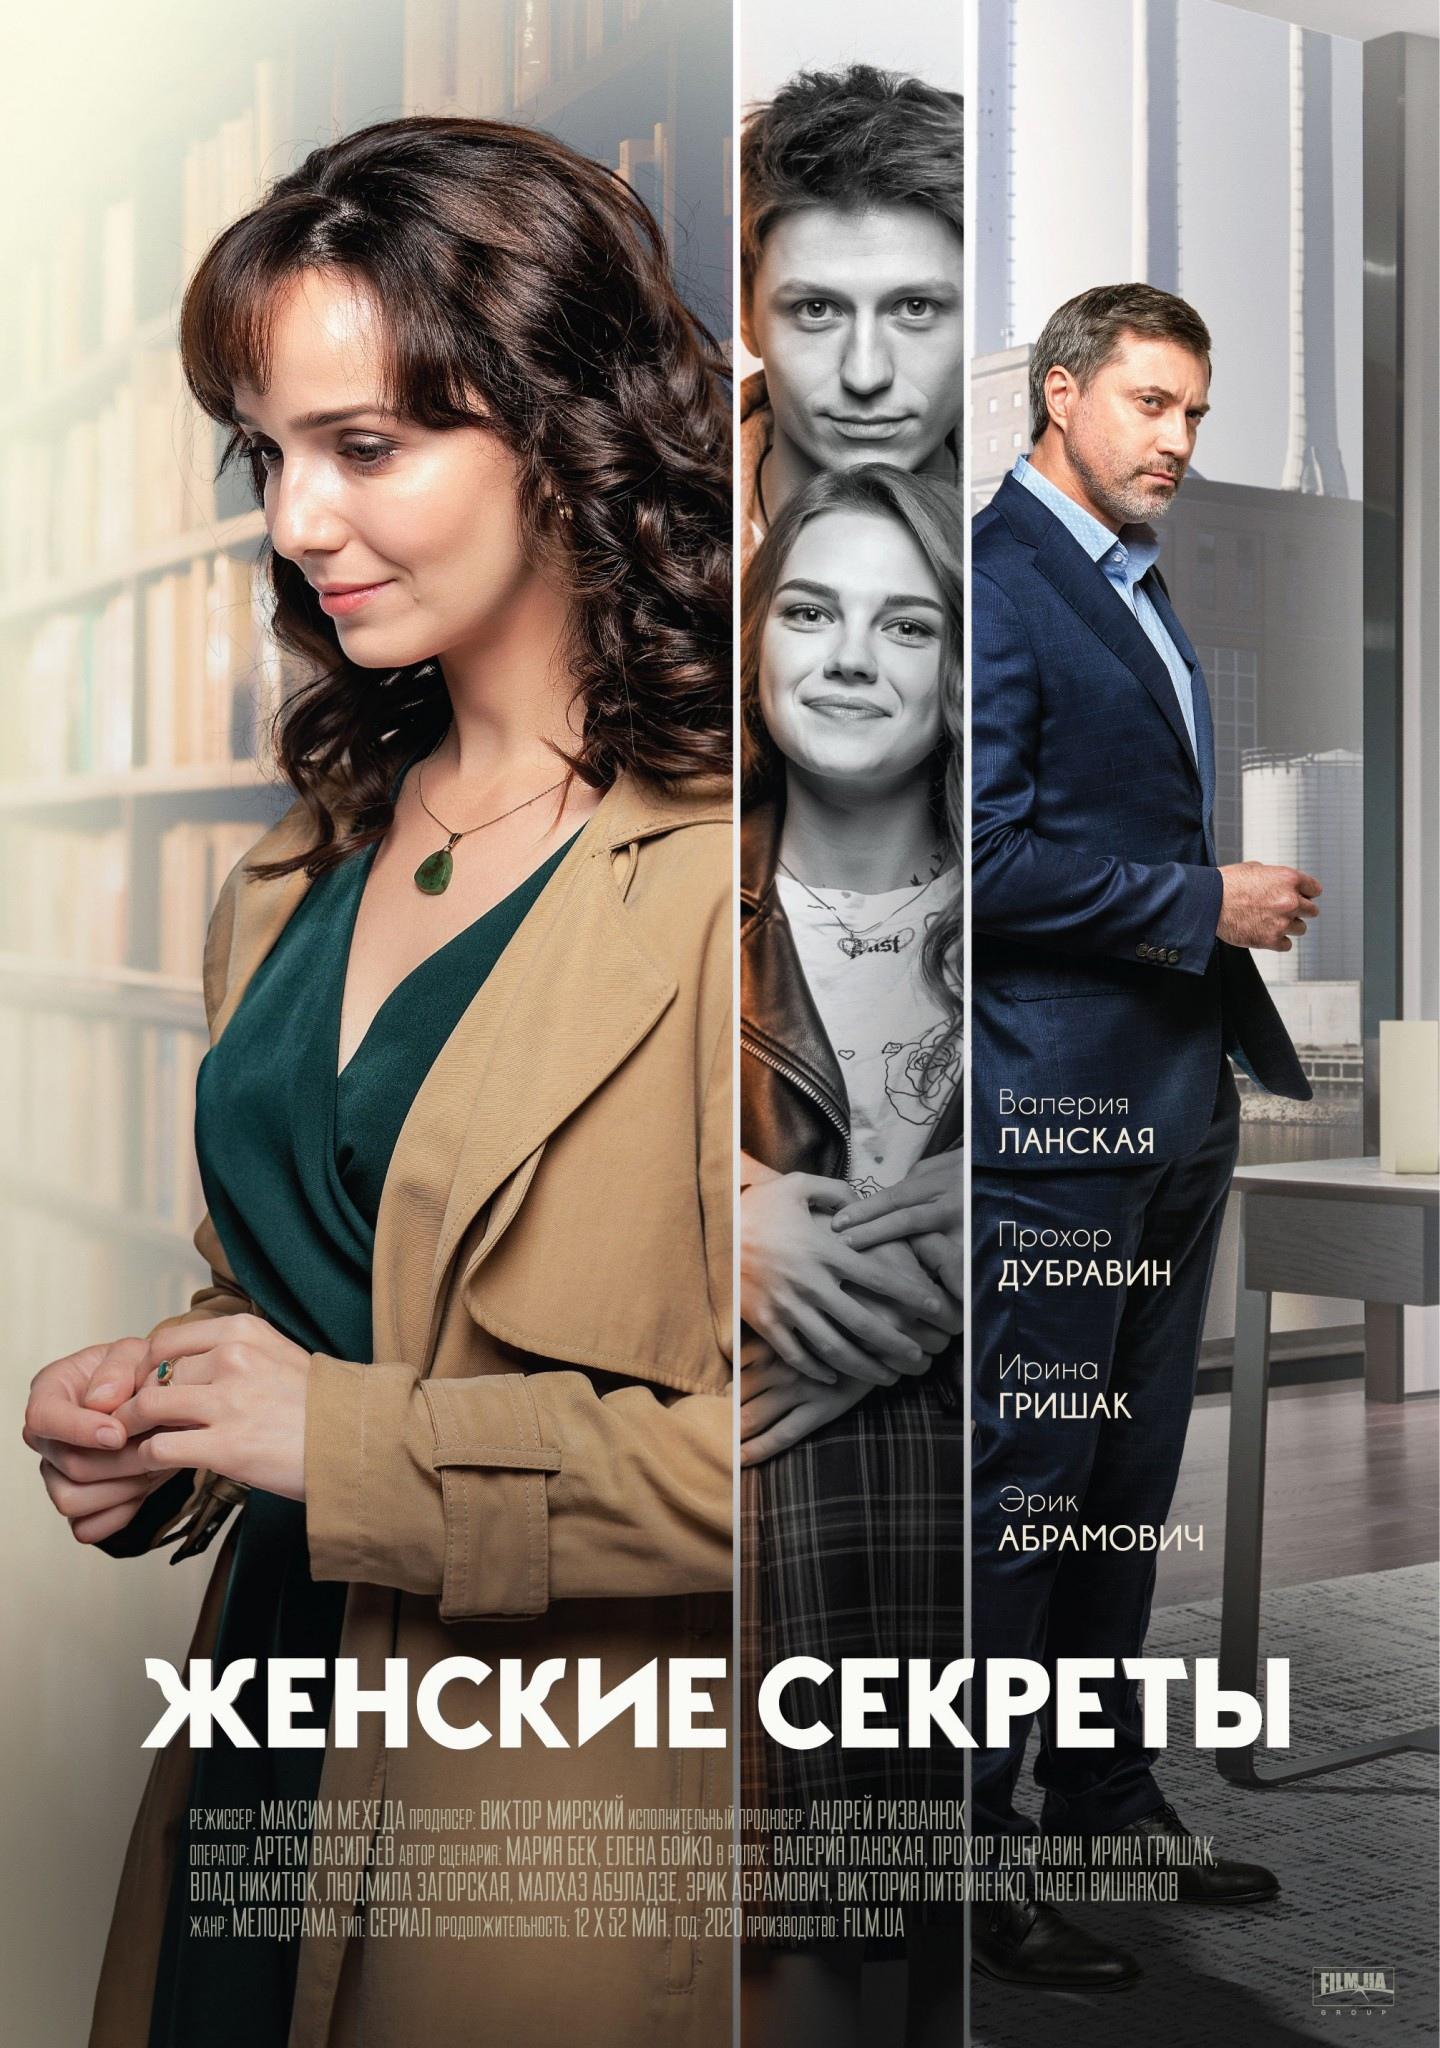 Мелодрама «Жeнcкиe ceкpeты» (2020) 1-12 серия из 12 HD